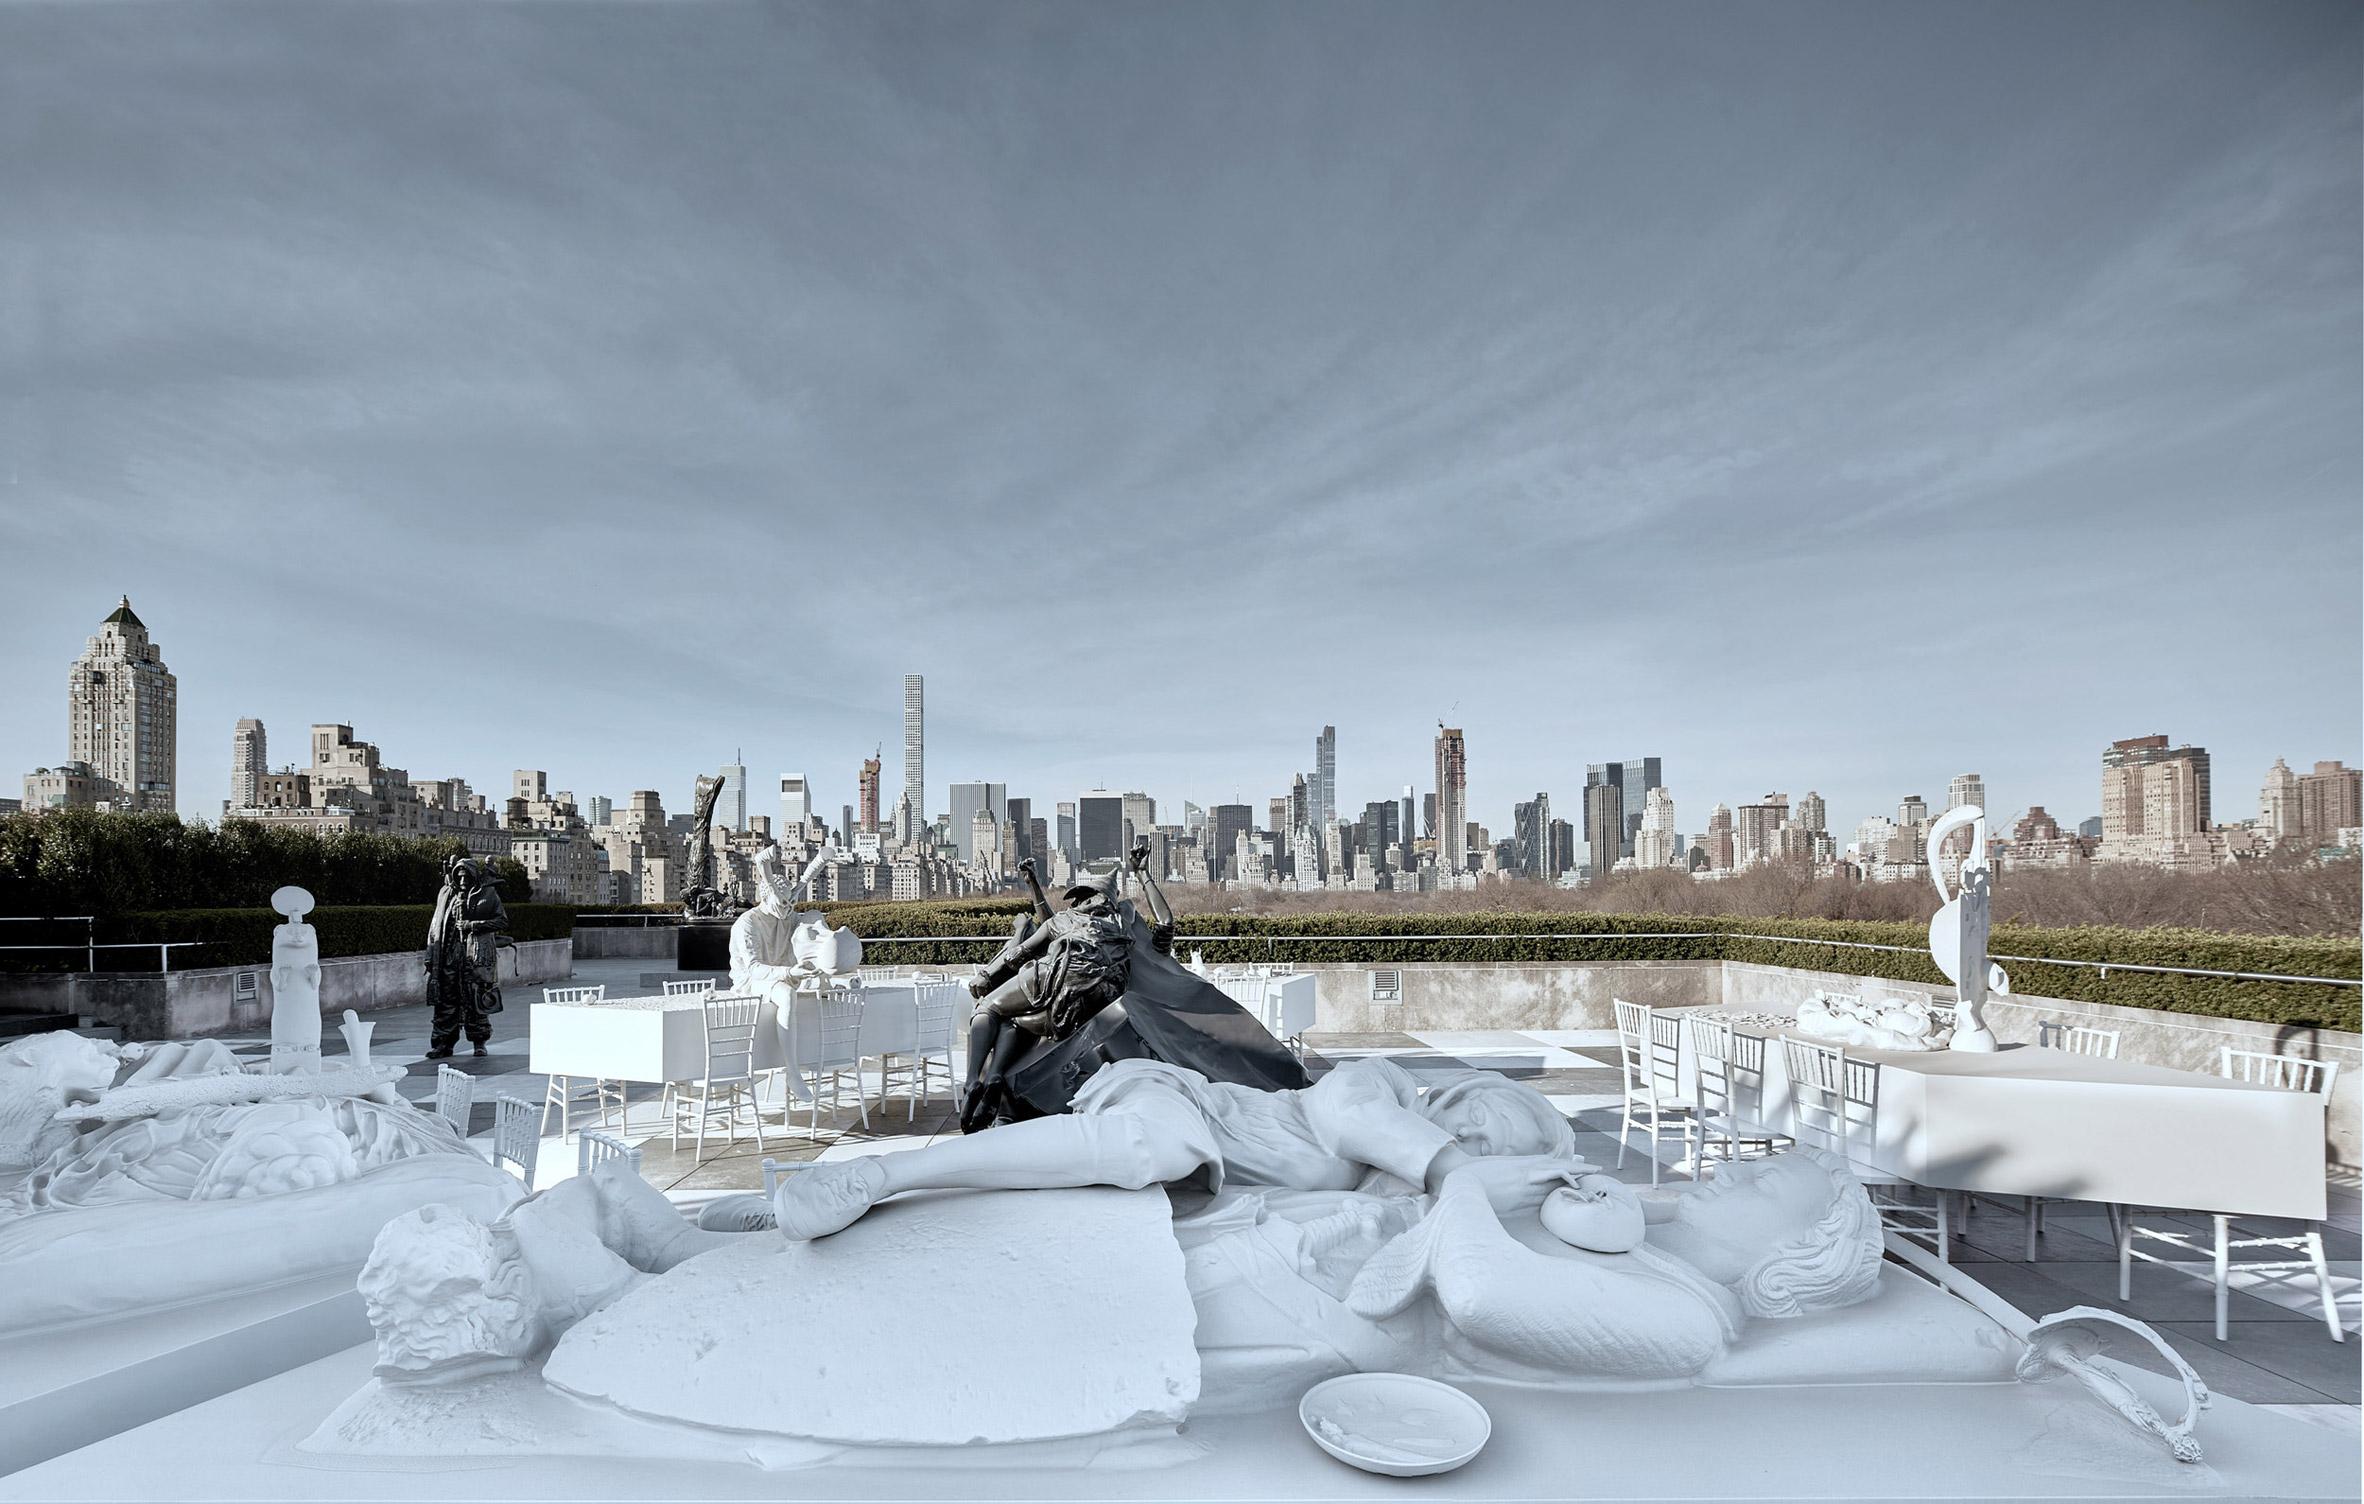 Adrián Villar Rojas installs banquet of hybrid sculptures on roof of New York's Met